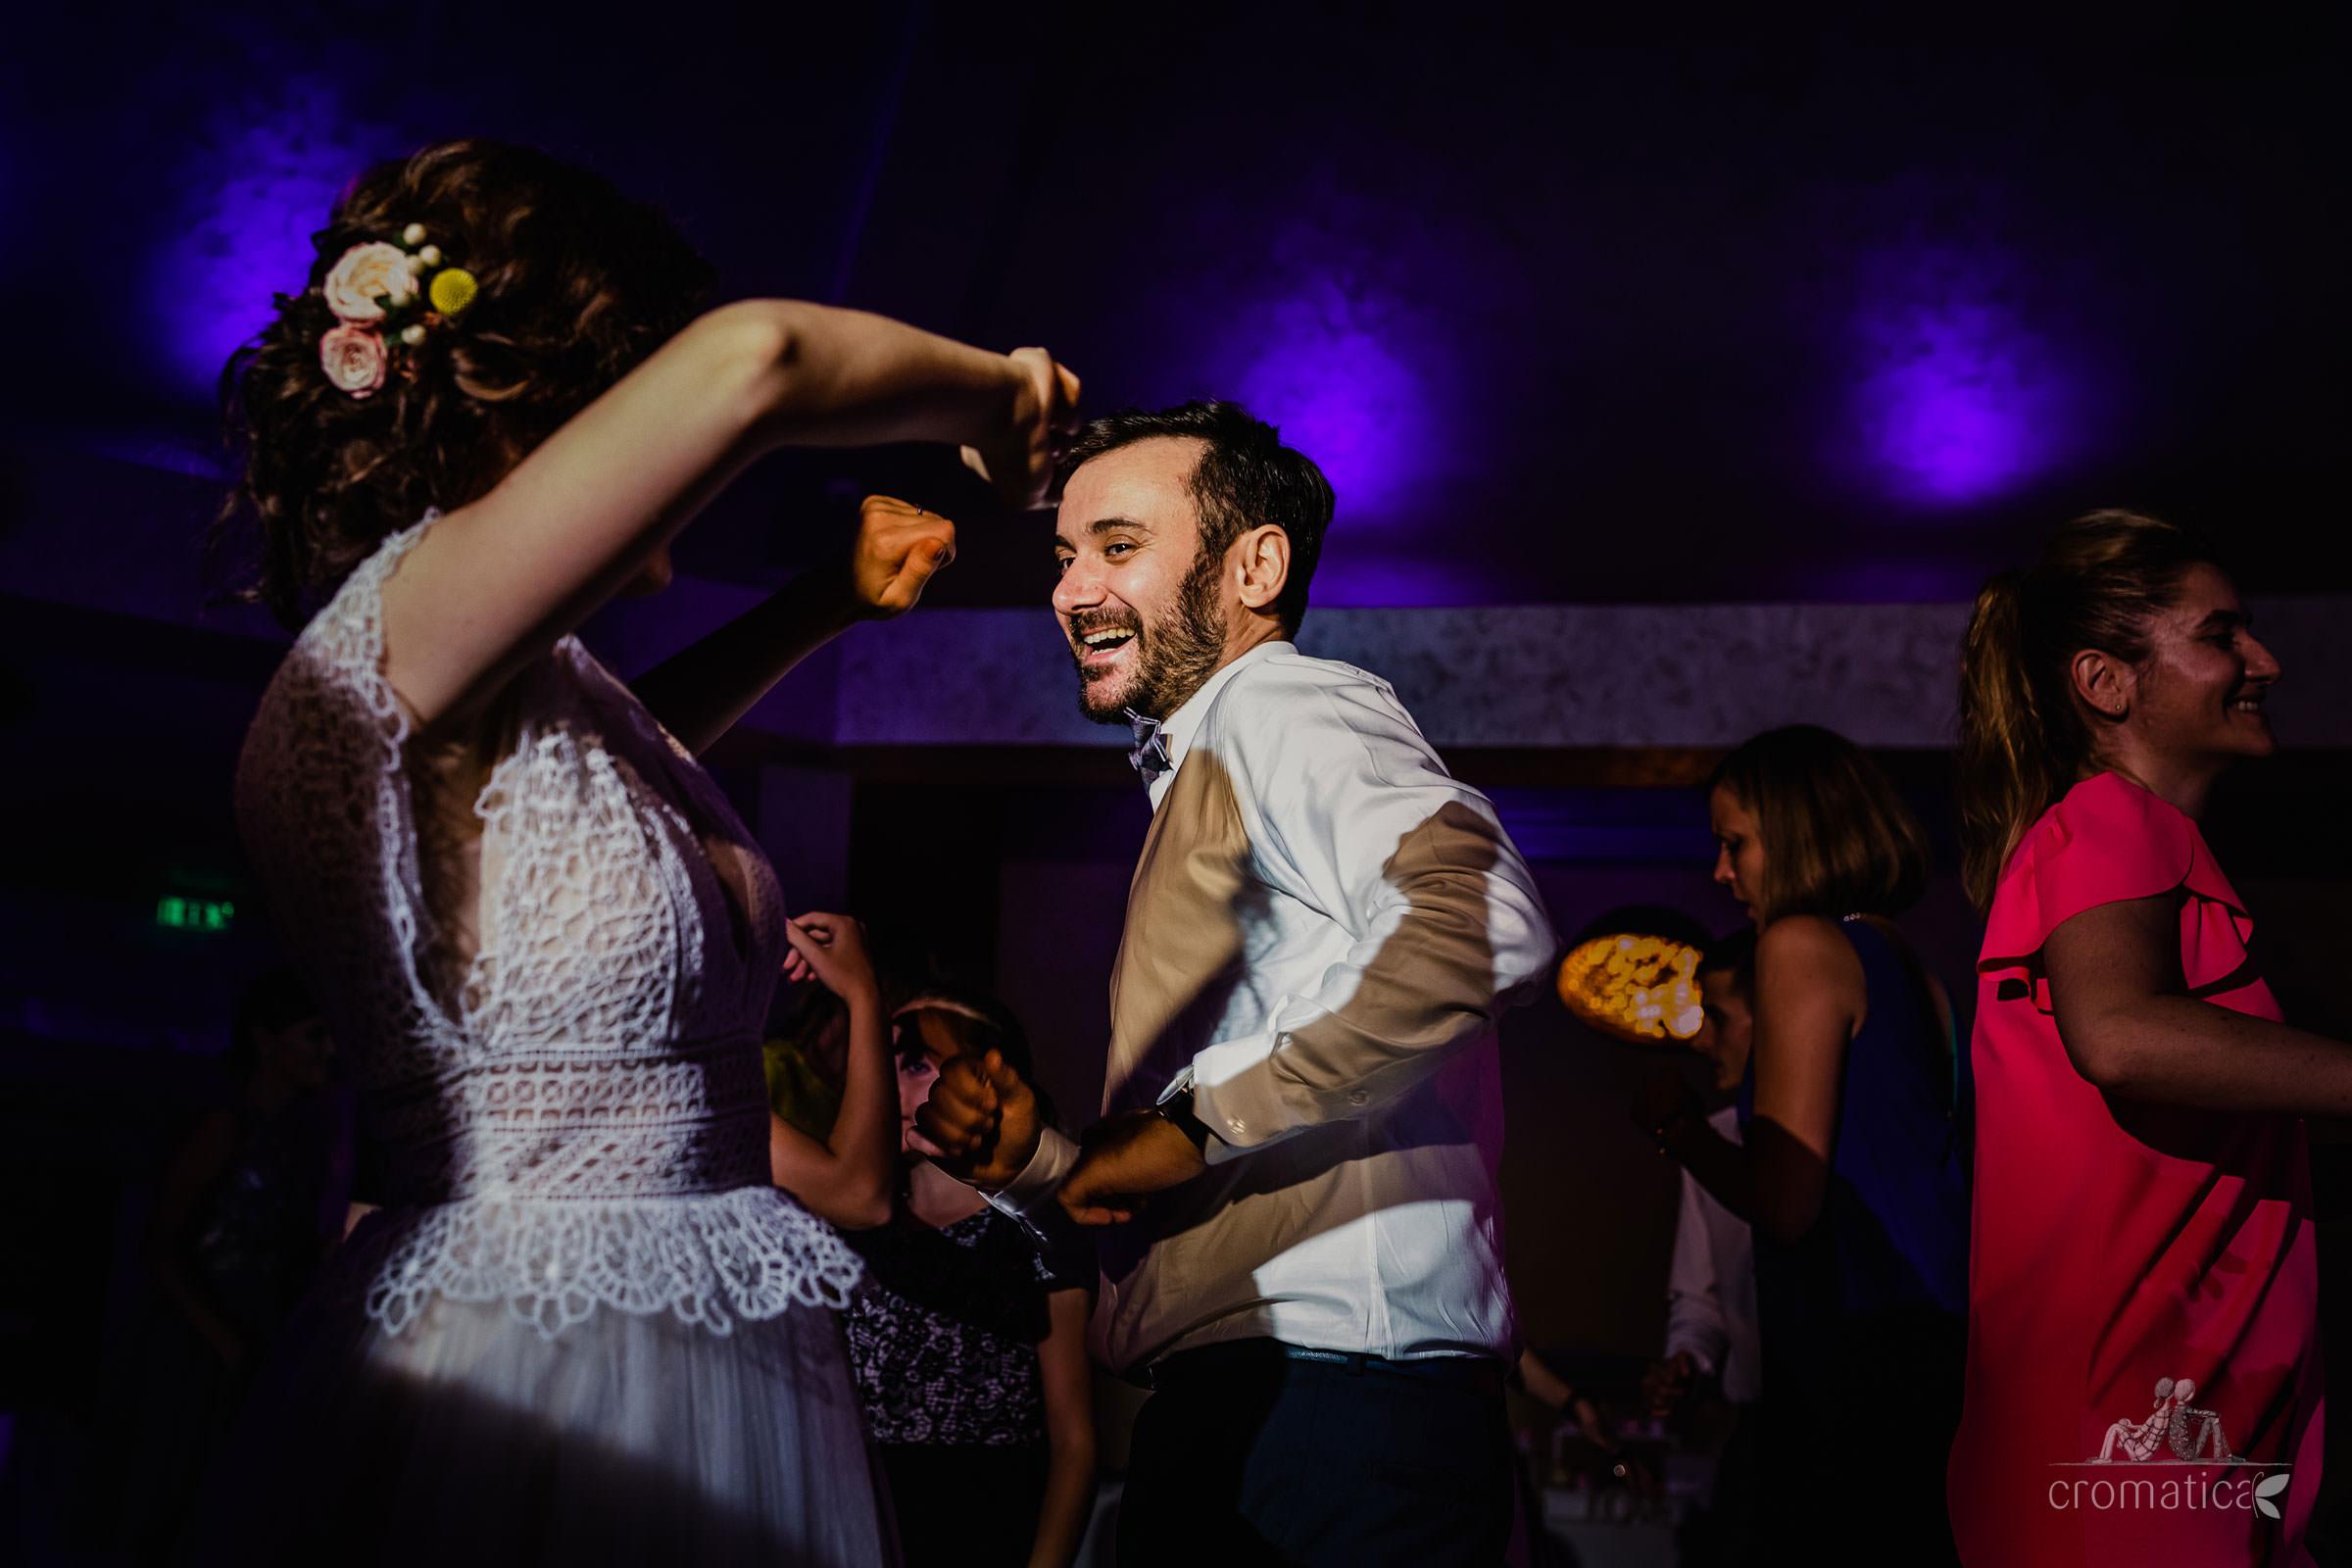 roxana mihai fotografii nunta la seratta 080